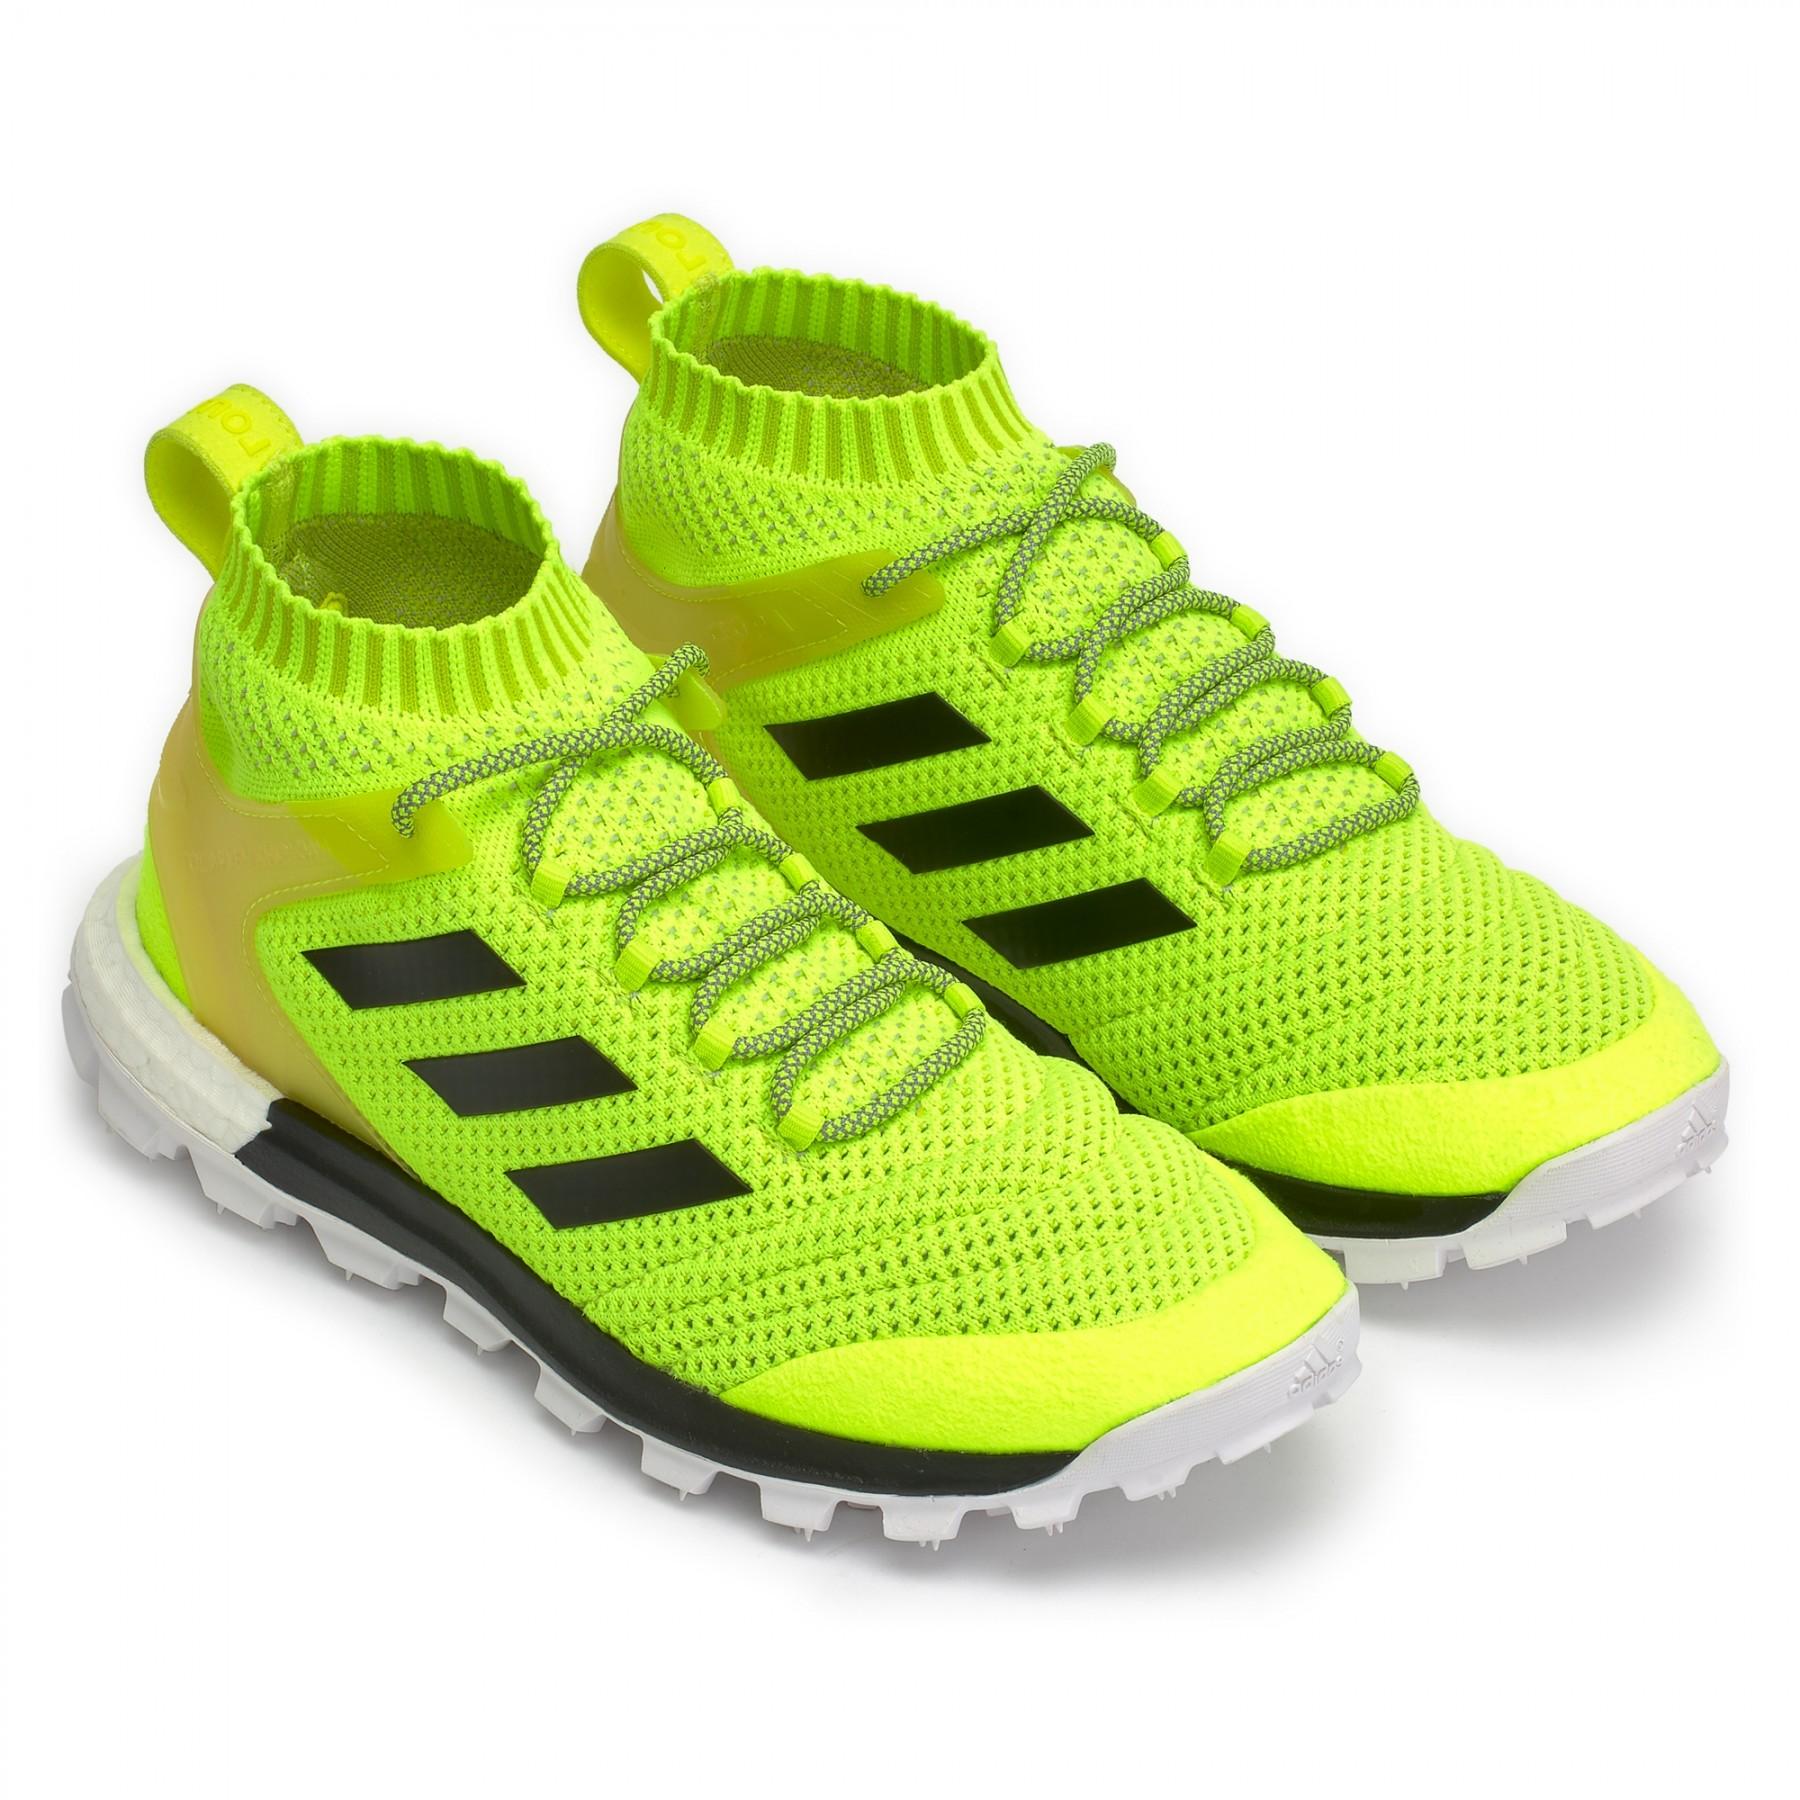 size 40 b58f7 8ba43 Very Goods  Gosha Rubchinskiy x adidas Copa PrimeKnit Mid Sneaker (Yellow)